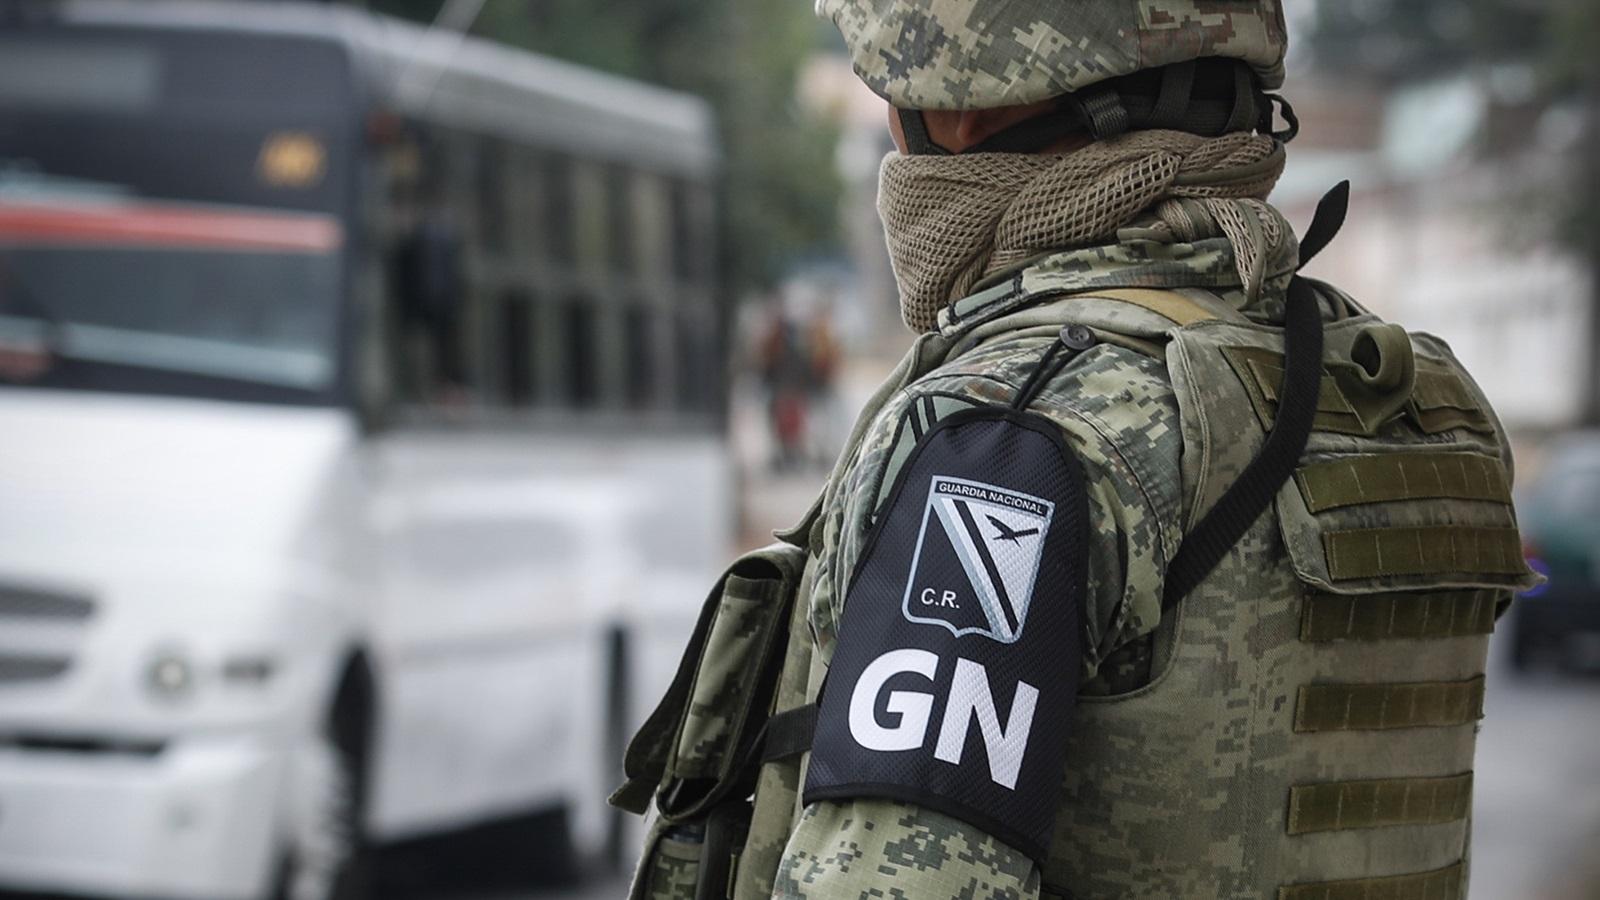 Leyes secundarias de Guardia Nacional atentan contra libre manifestación: ONU